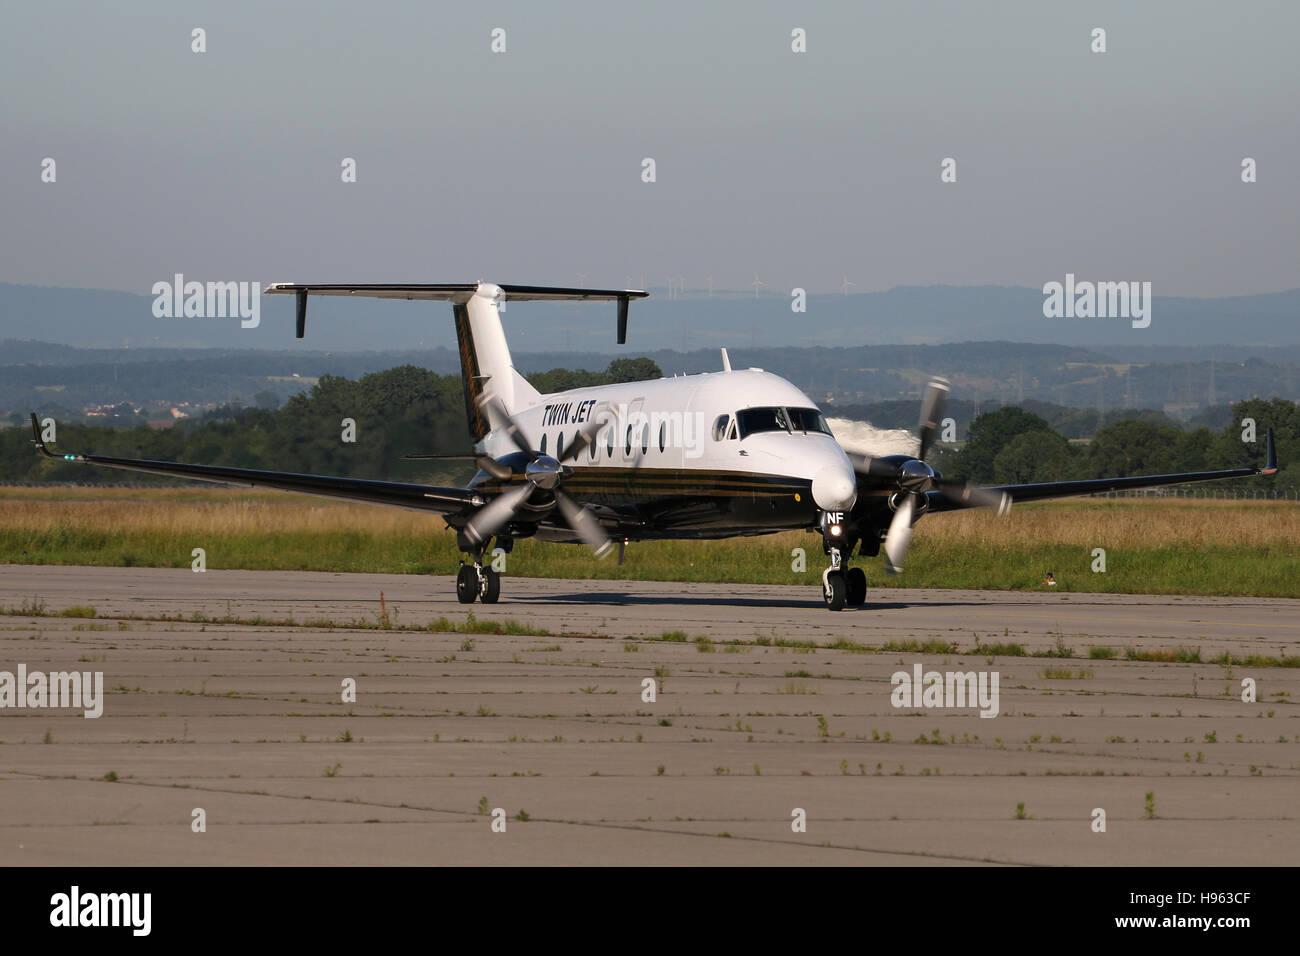 Stuttgart, Germany – June 23, 2016: Twin Jet, Beech 1900D Airliner, at Stuttgart Airport - Stock Image